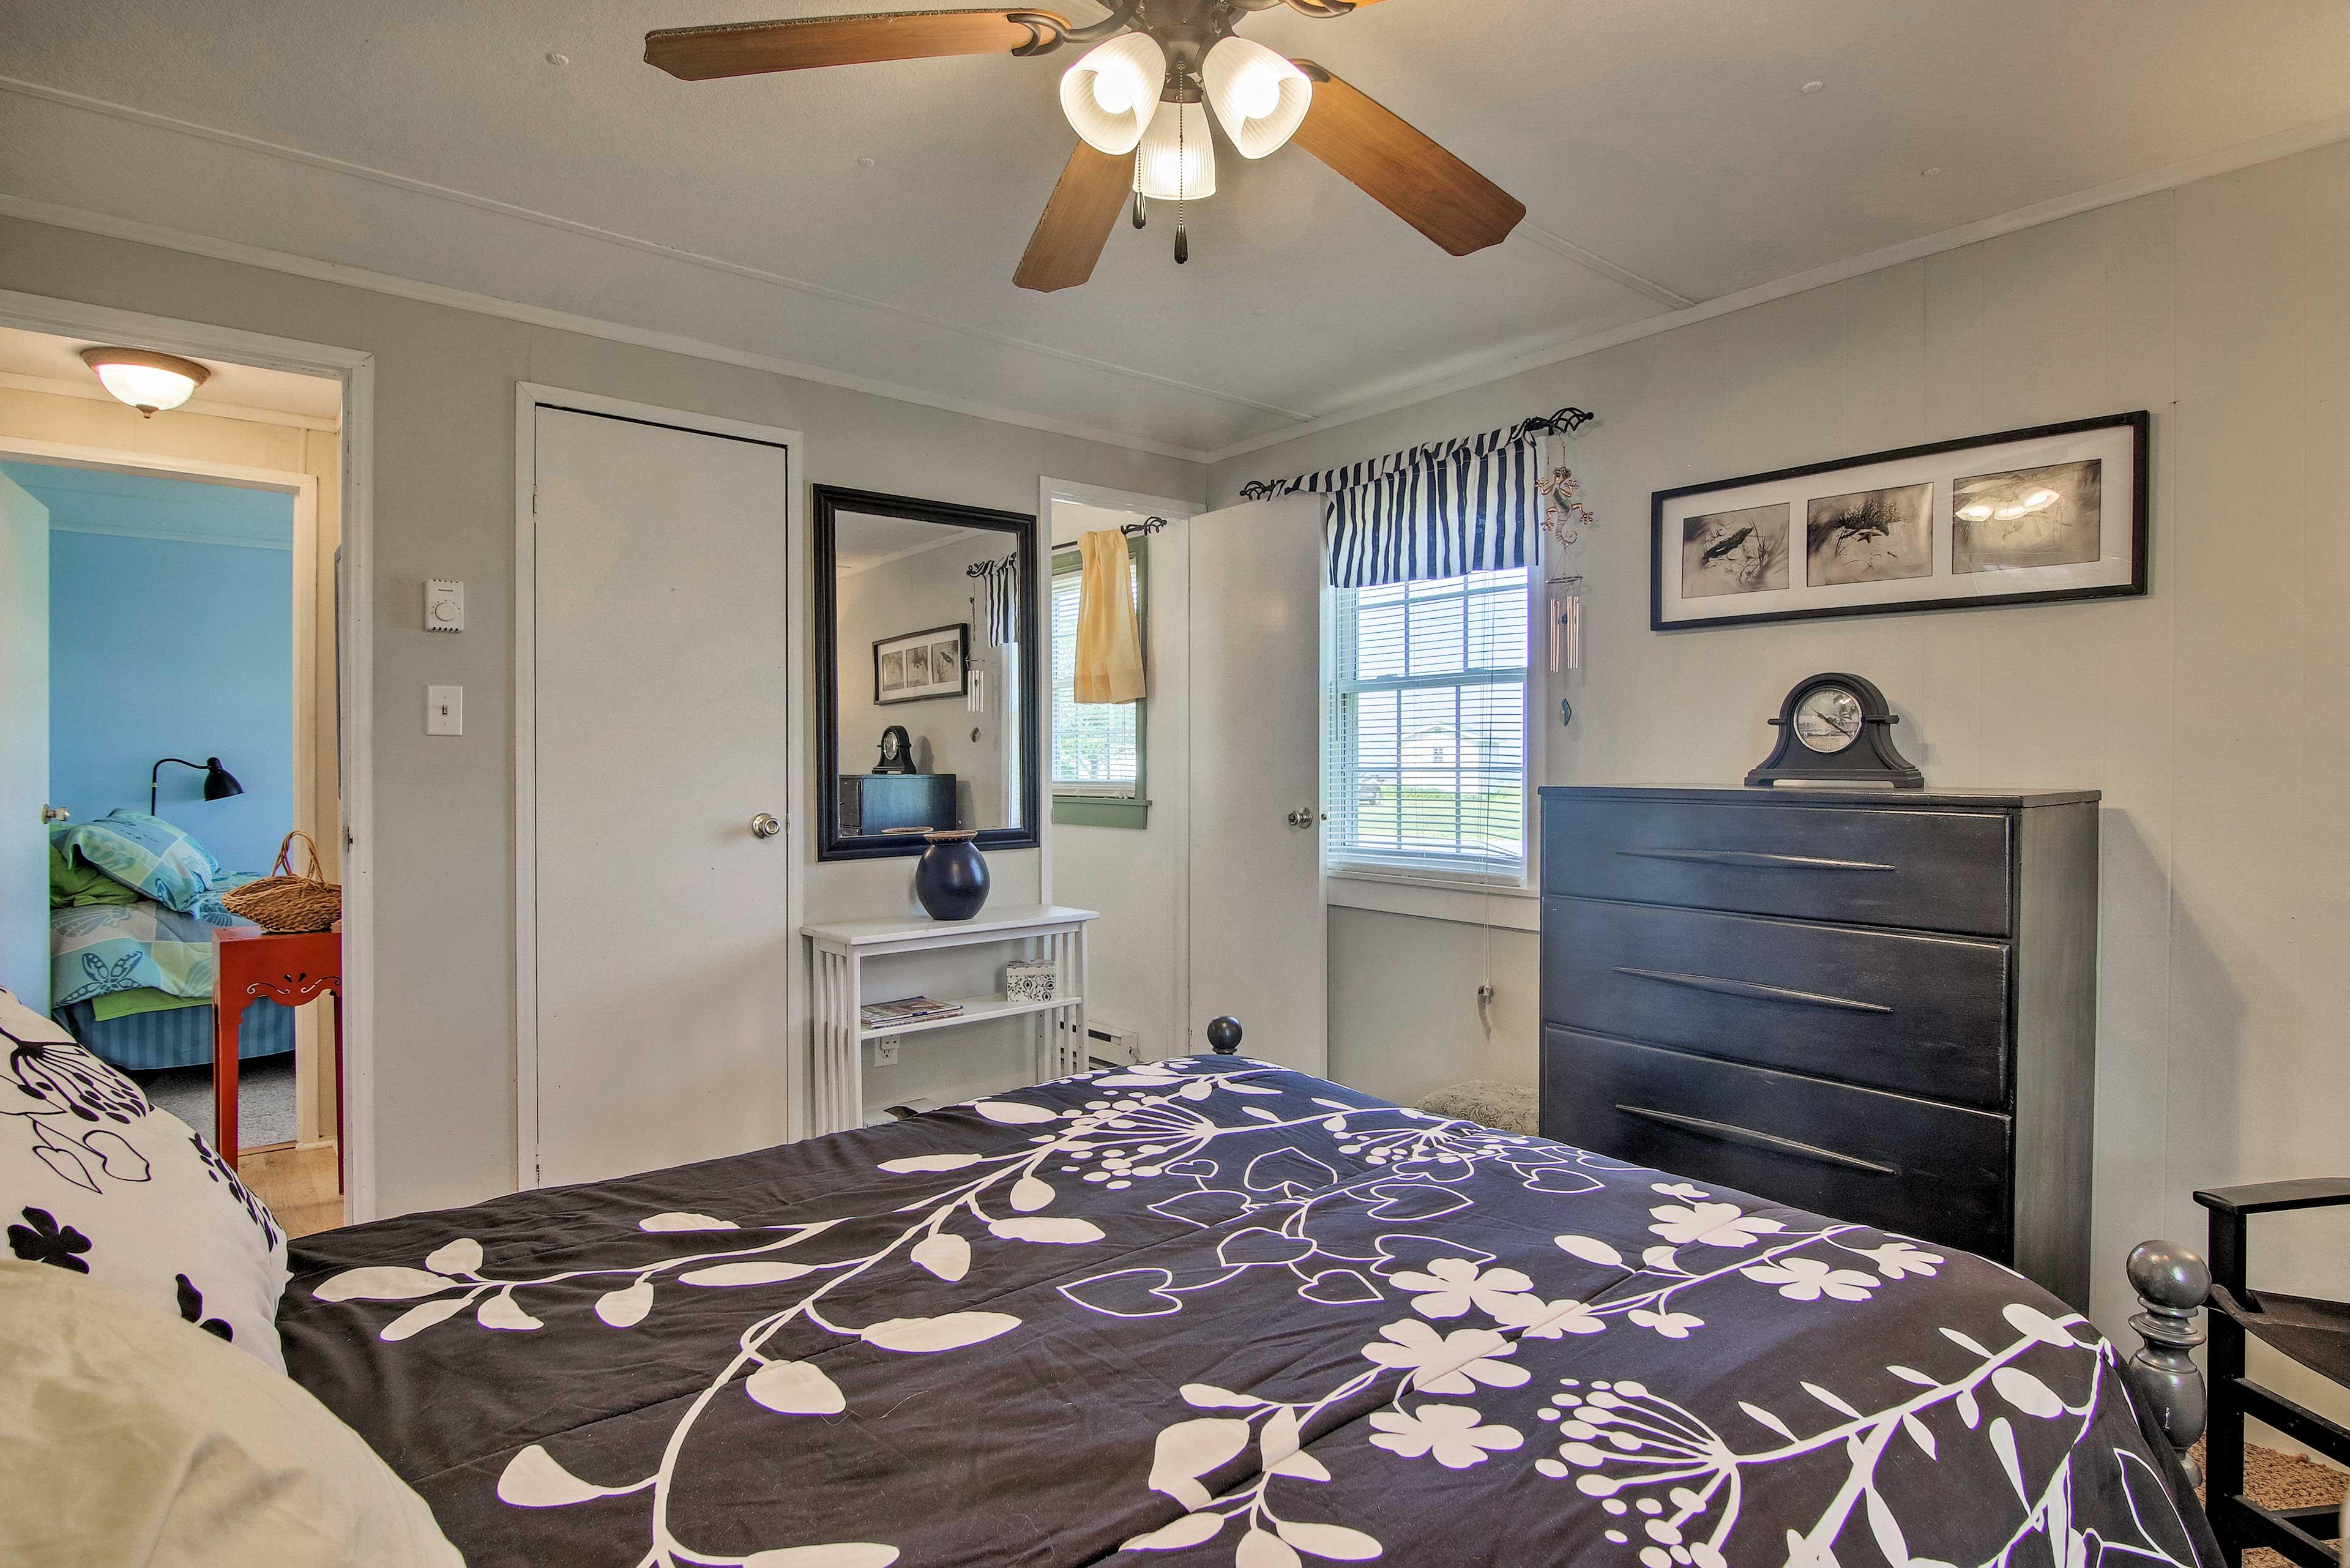 The room has a ceiling fan and en-suite bathroom.